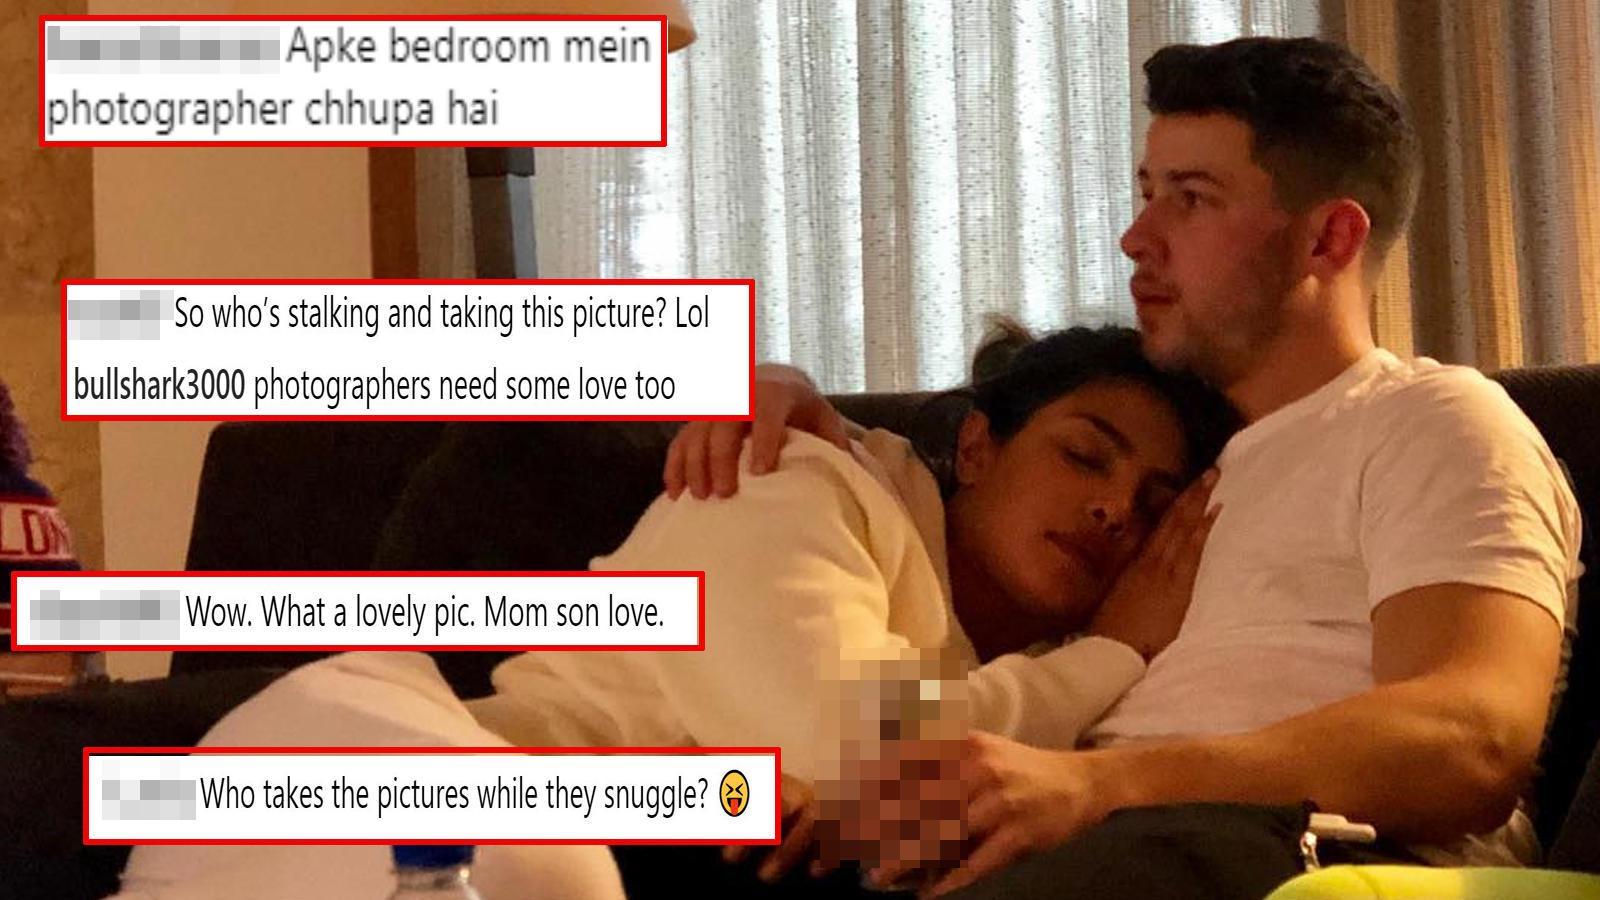 Priyanka Chopra and Nick Jonas' latest cosy picture gets trolled